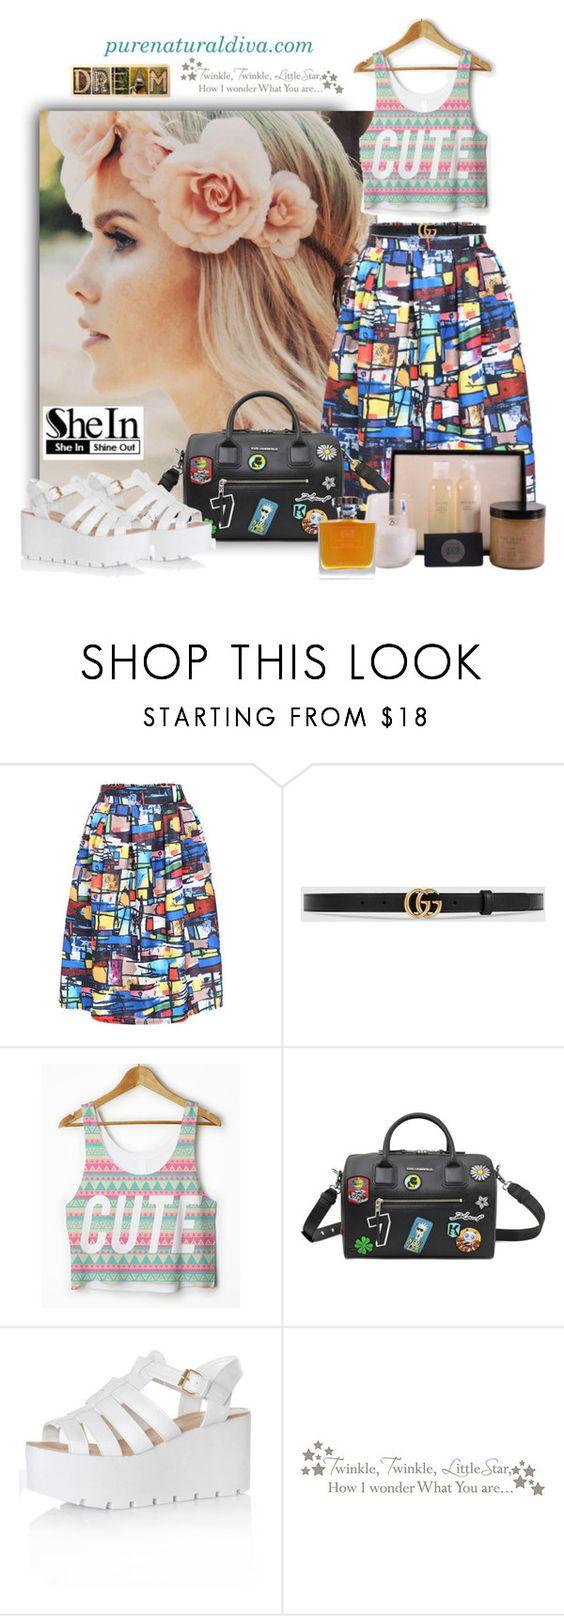 """Multicolor Print Midi Skirt"" by purenaturaldiva ❤ liked on Polyvore featuring Gucci, Karl Lagerfeld, Glamorous, WallPops, naturalbeauty, organicbeauty and purenaturaldiva"